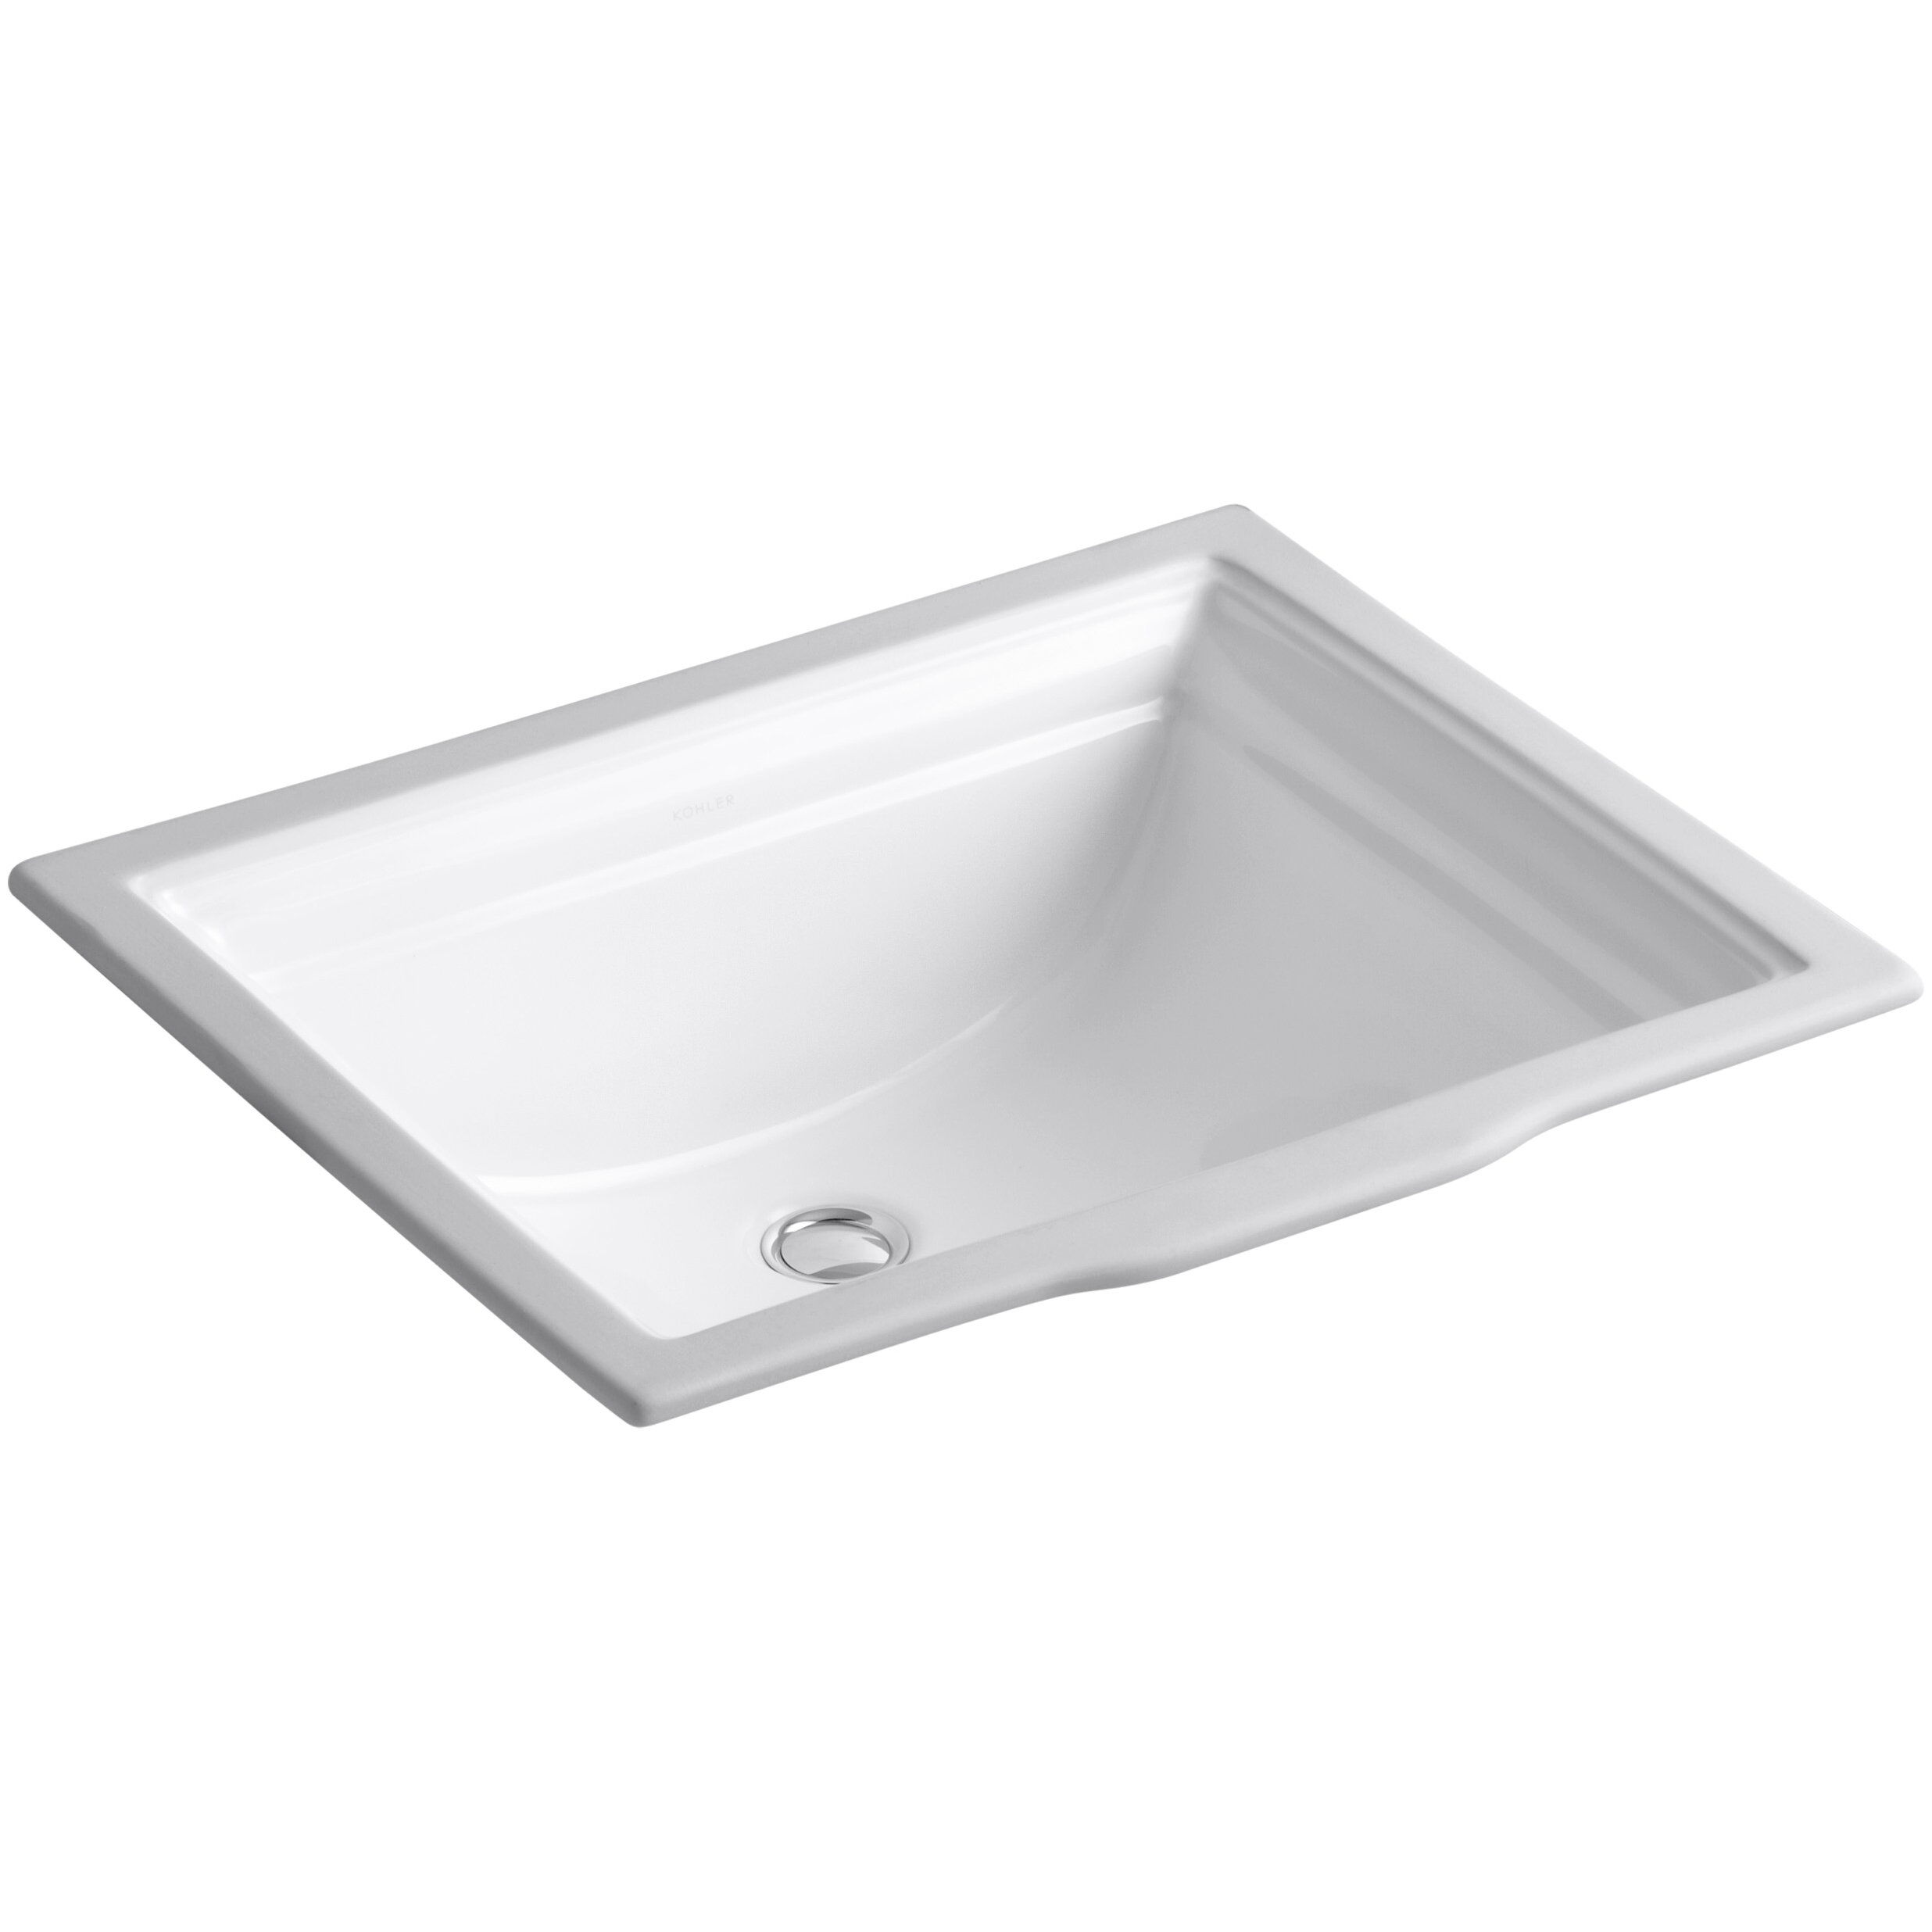 memoirs rectangular undermount bathroom sink with overflow